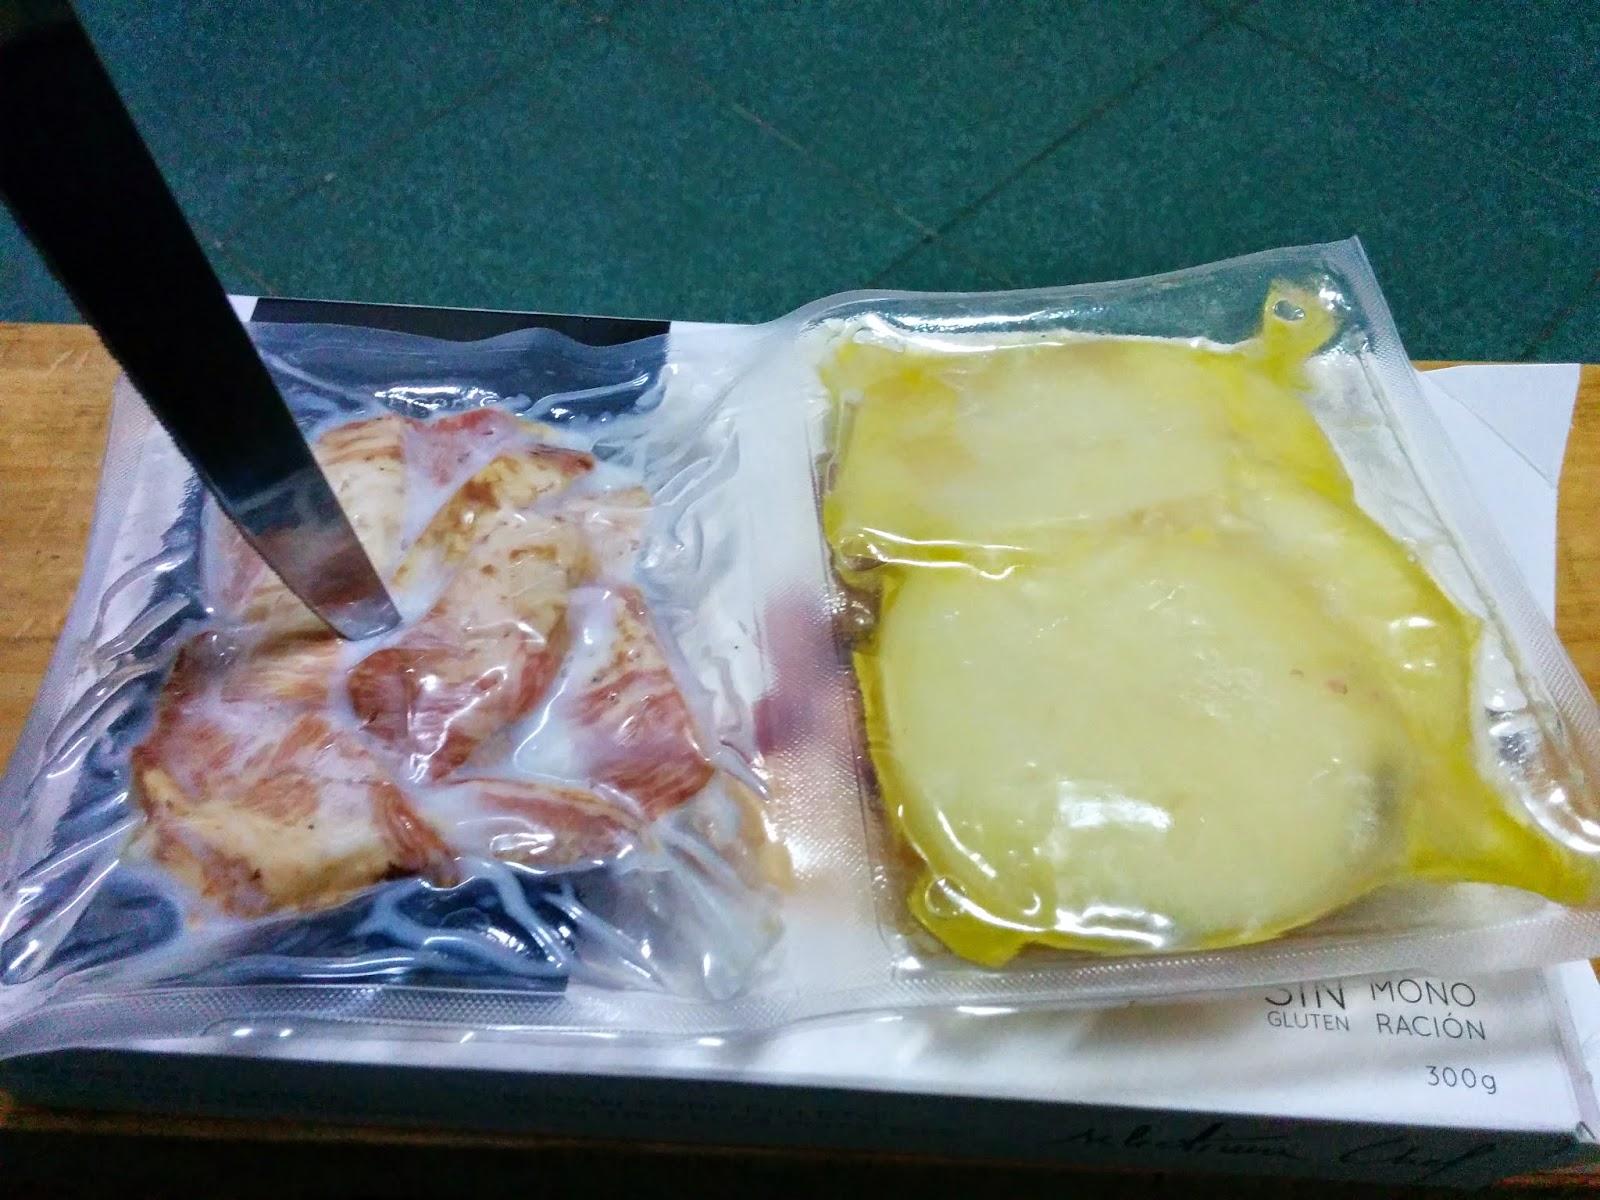 Secreto de cerdo ibérico con patatas trufadas